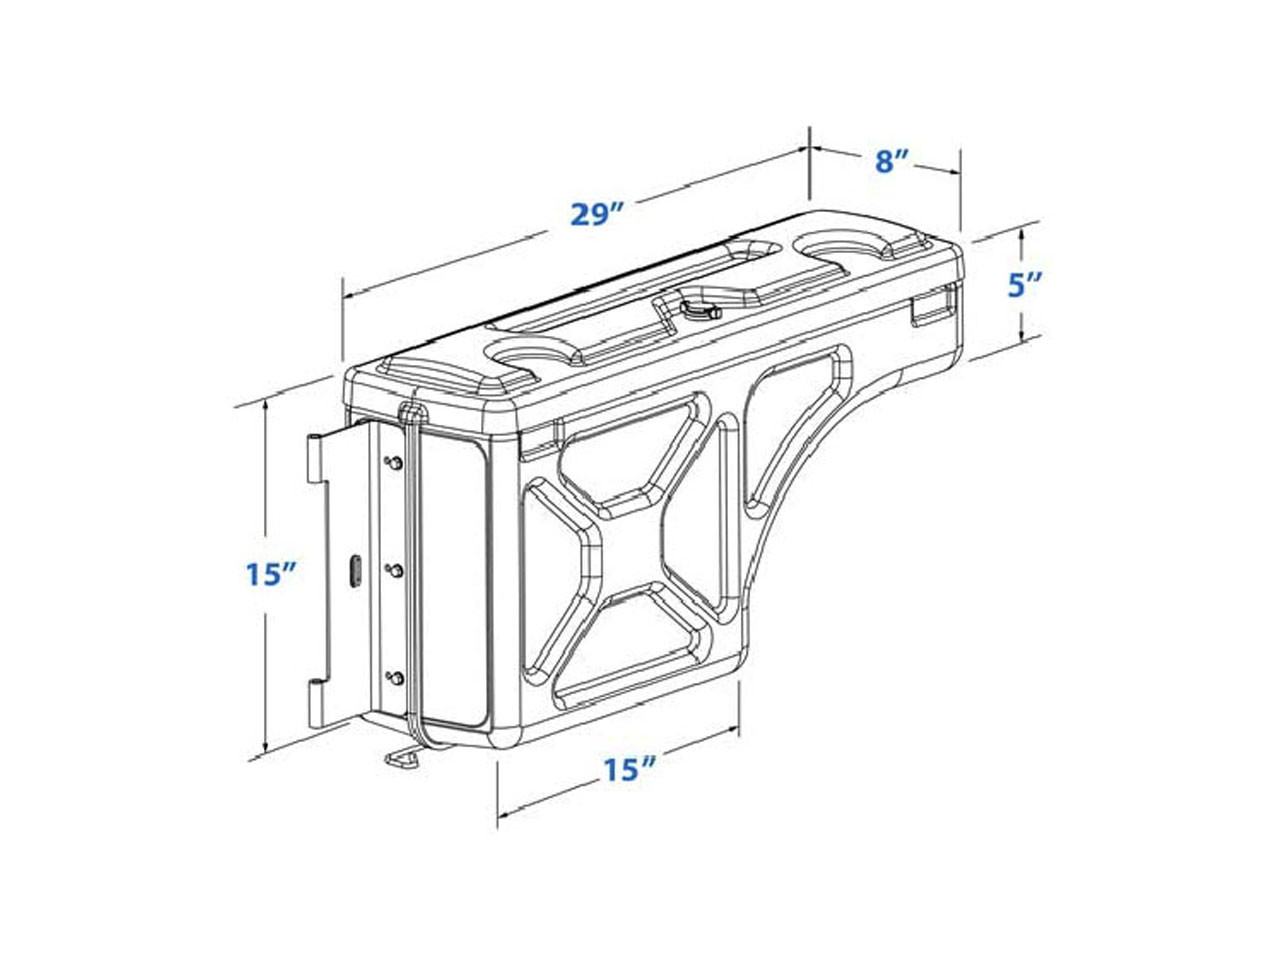 2012 On Isuzu D-Max Swing Case Tool Box (Left Hand Side